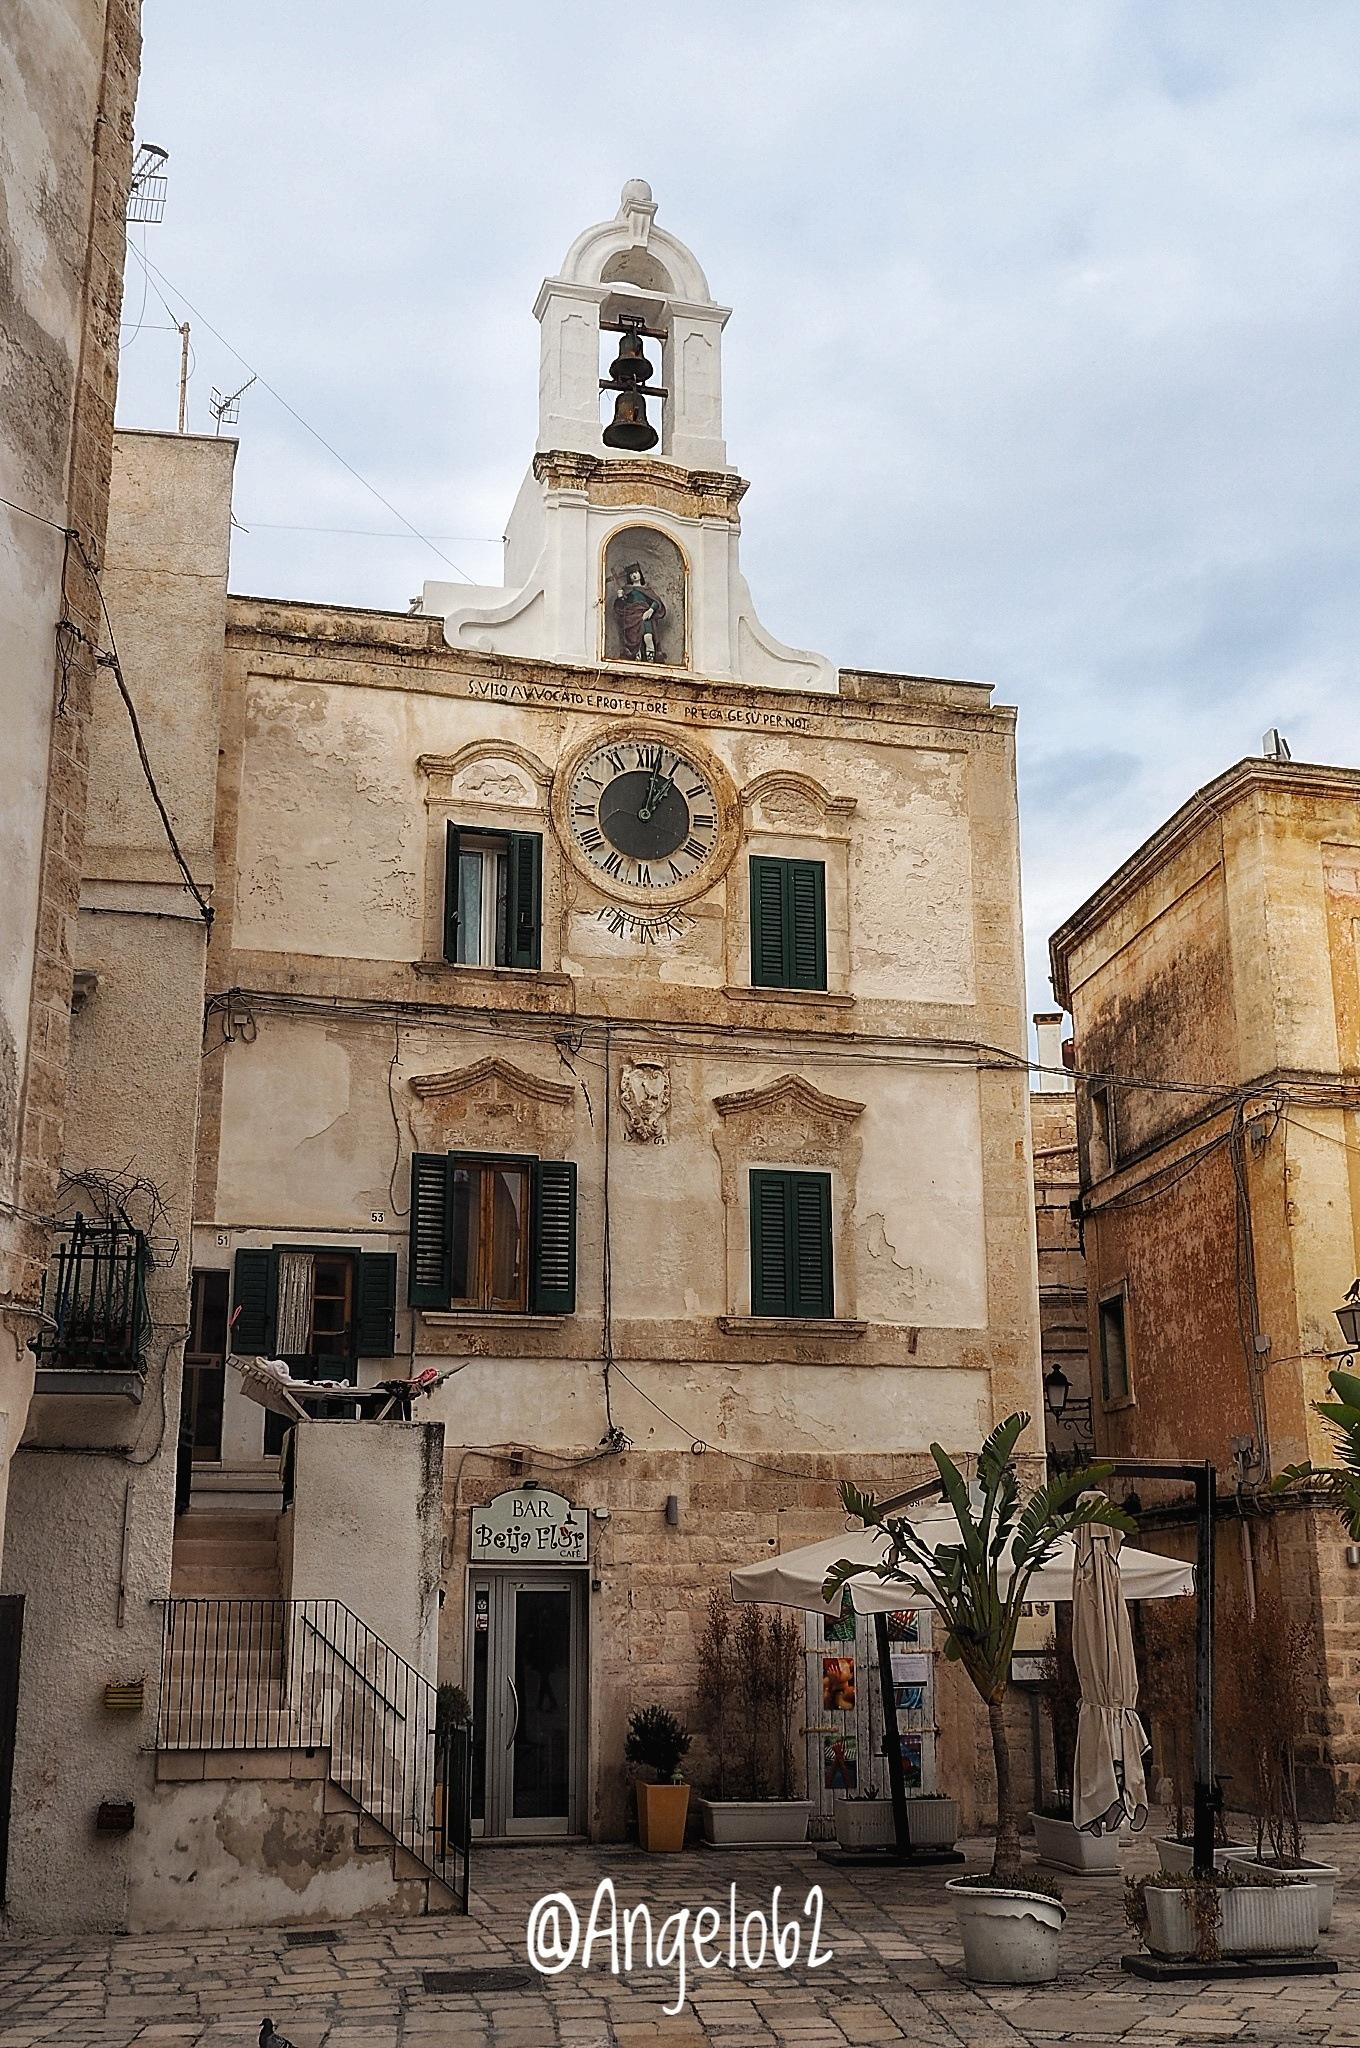 Polignano,  centro storico  by Angelo62